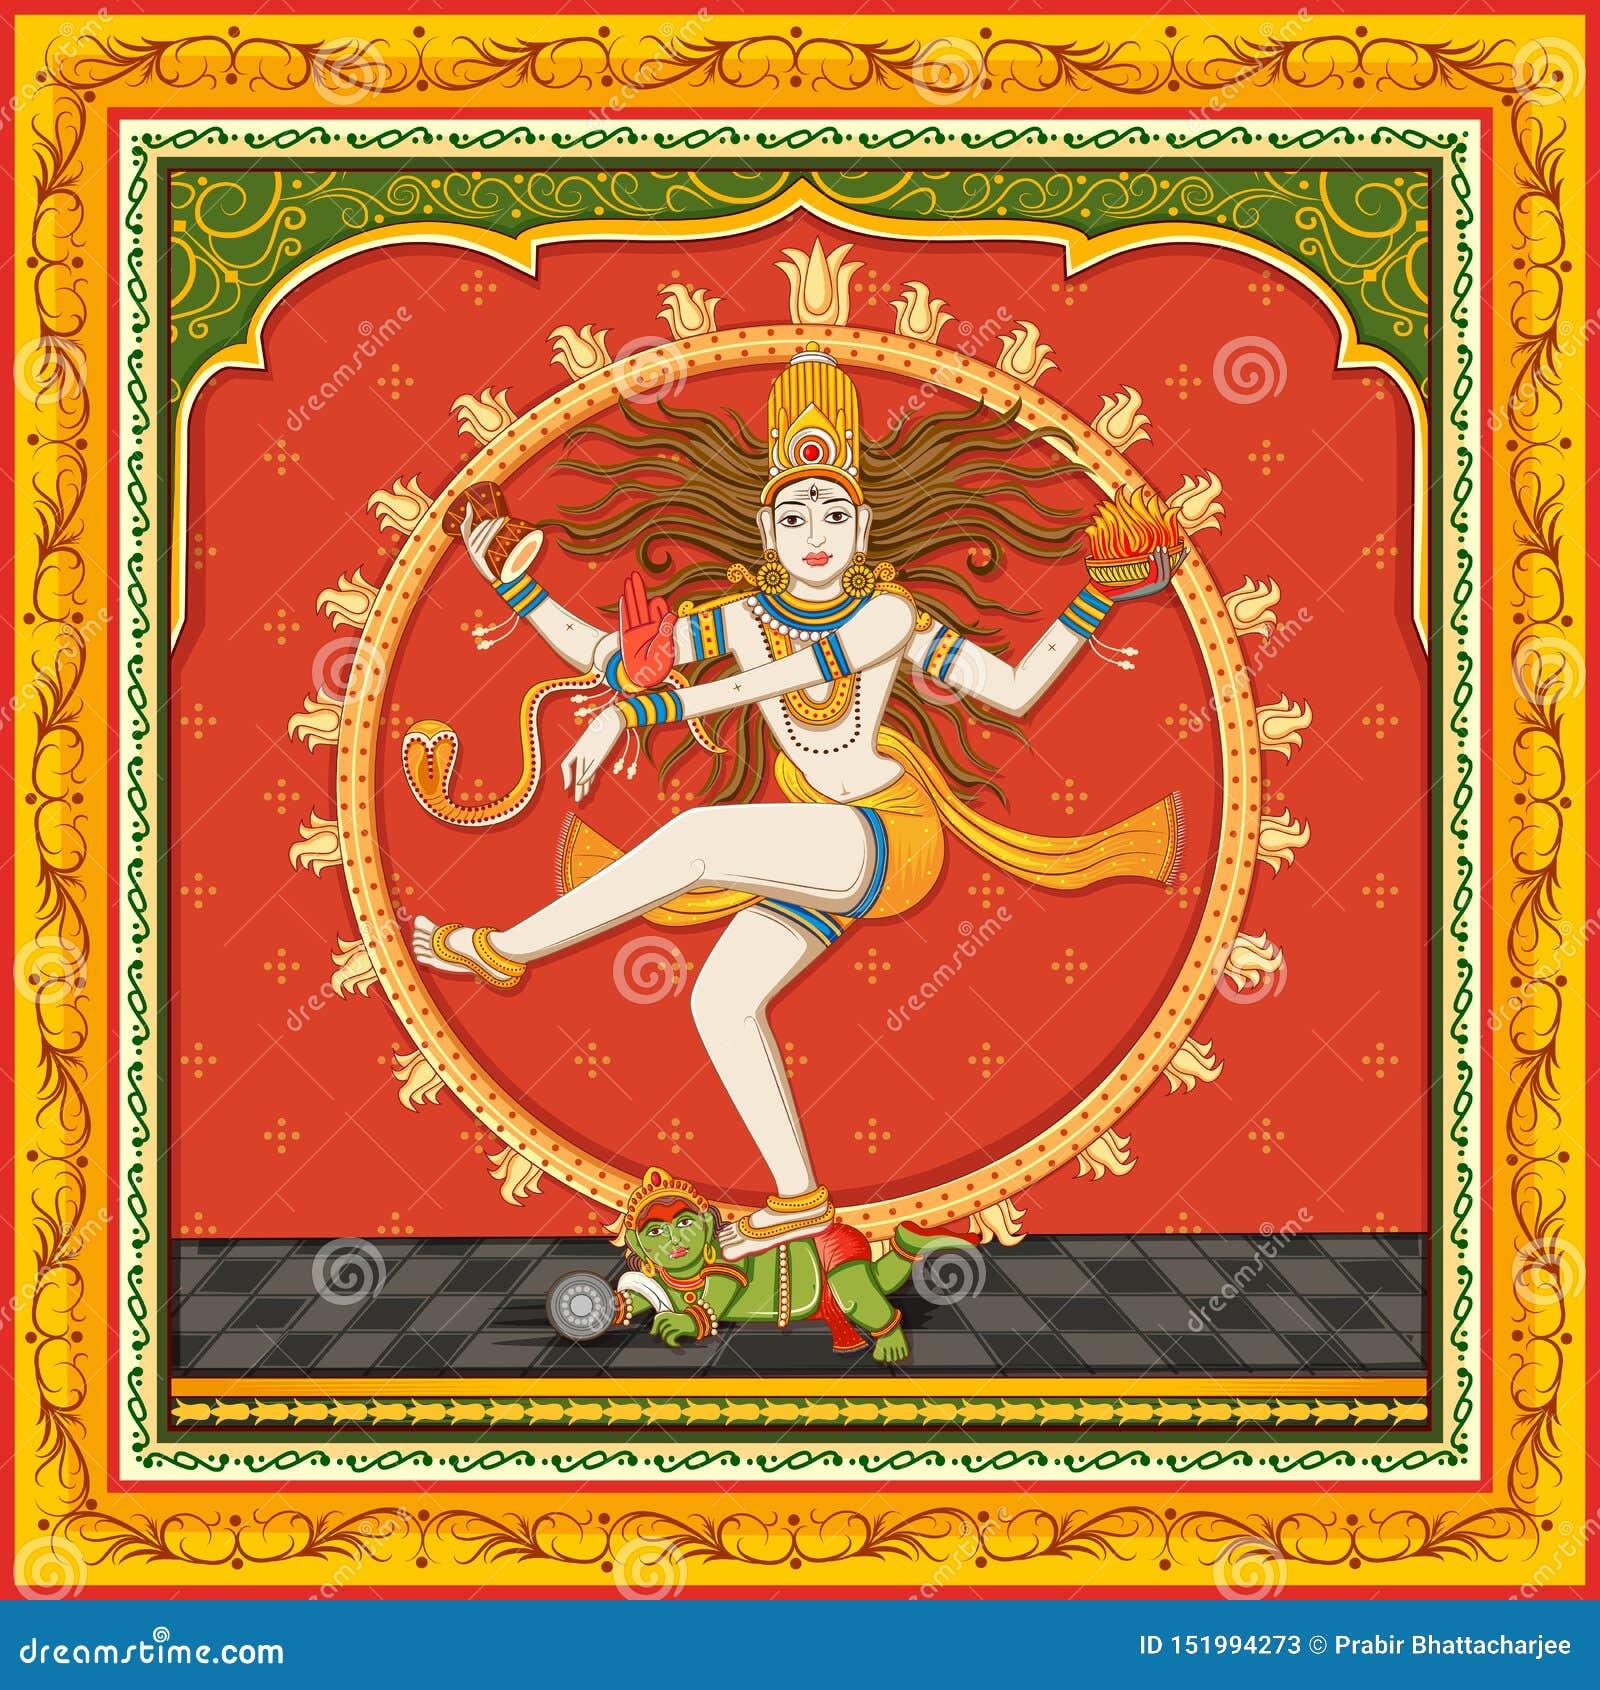 Shiva Nataraja Stock Illustrations – 553 Shiva Nataraja Stock  Illustrations, Vectors & Clipart - Dreamstime